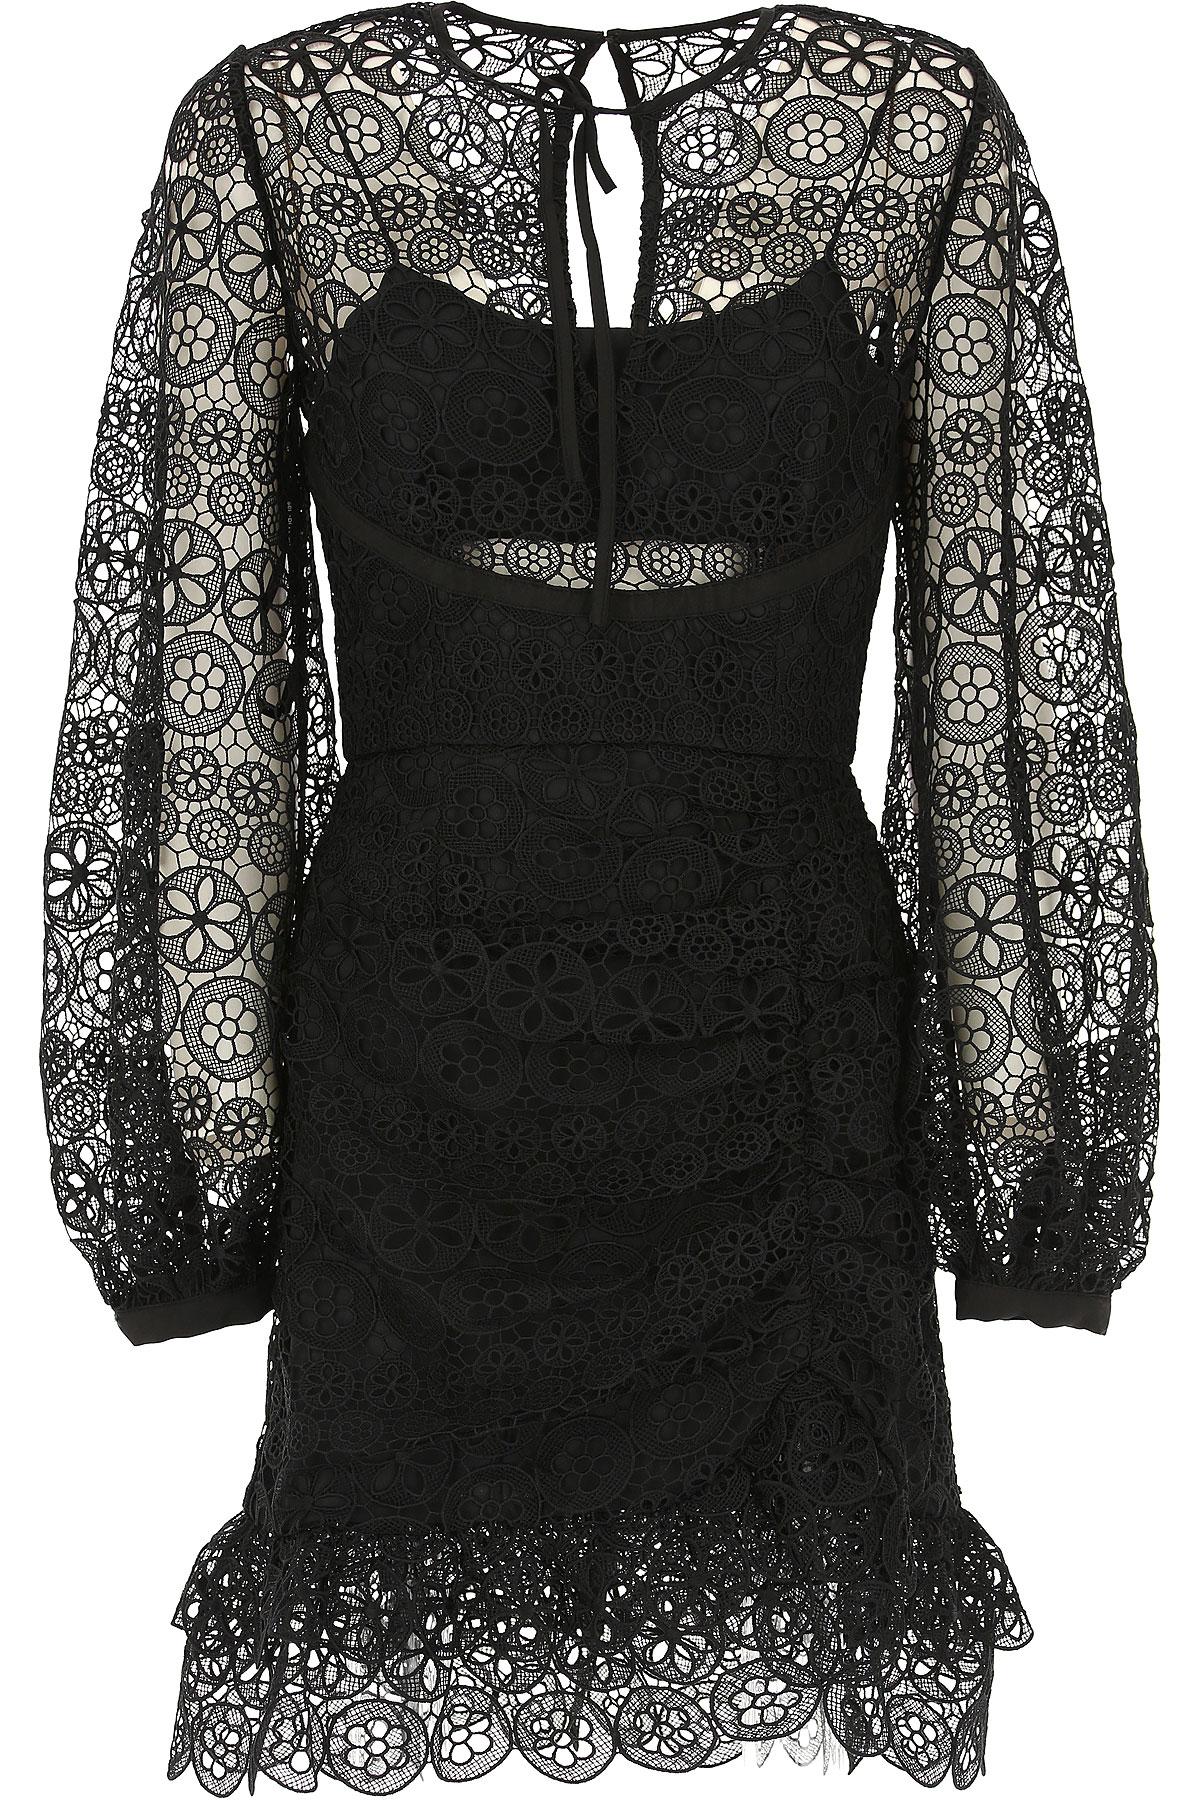 Self-portrait Dress for Women, Evening Cocktail Party On Sale, Black, polyestere, 2017, UK 8 - US 6 - EU 40 UK 10 - US 8 - EU 42